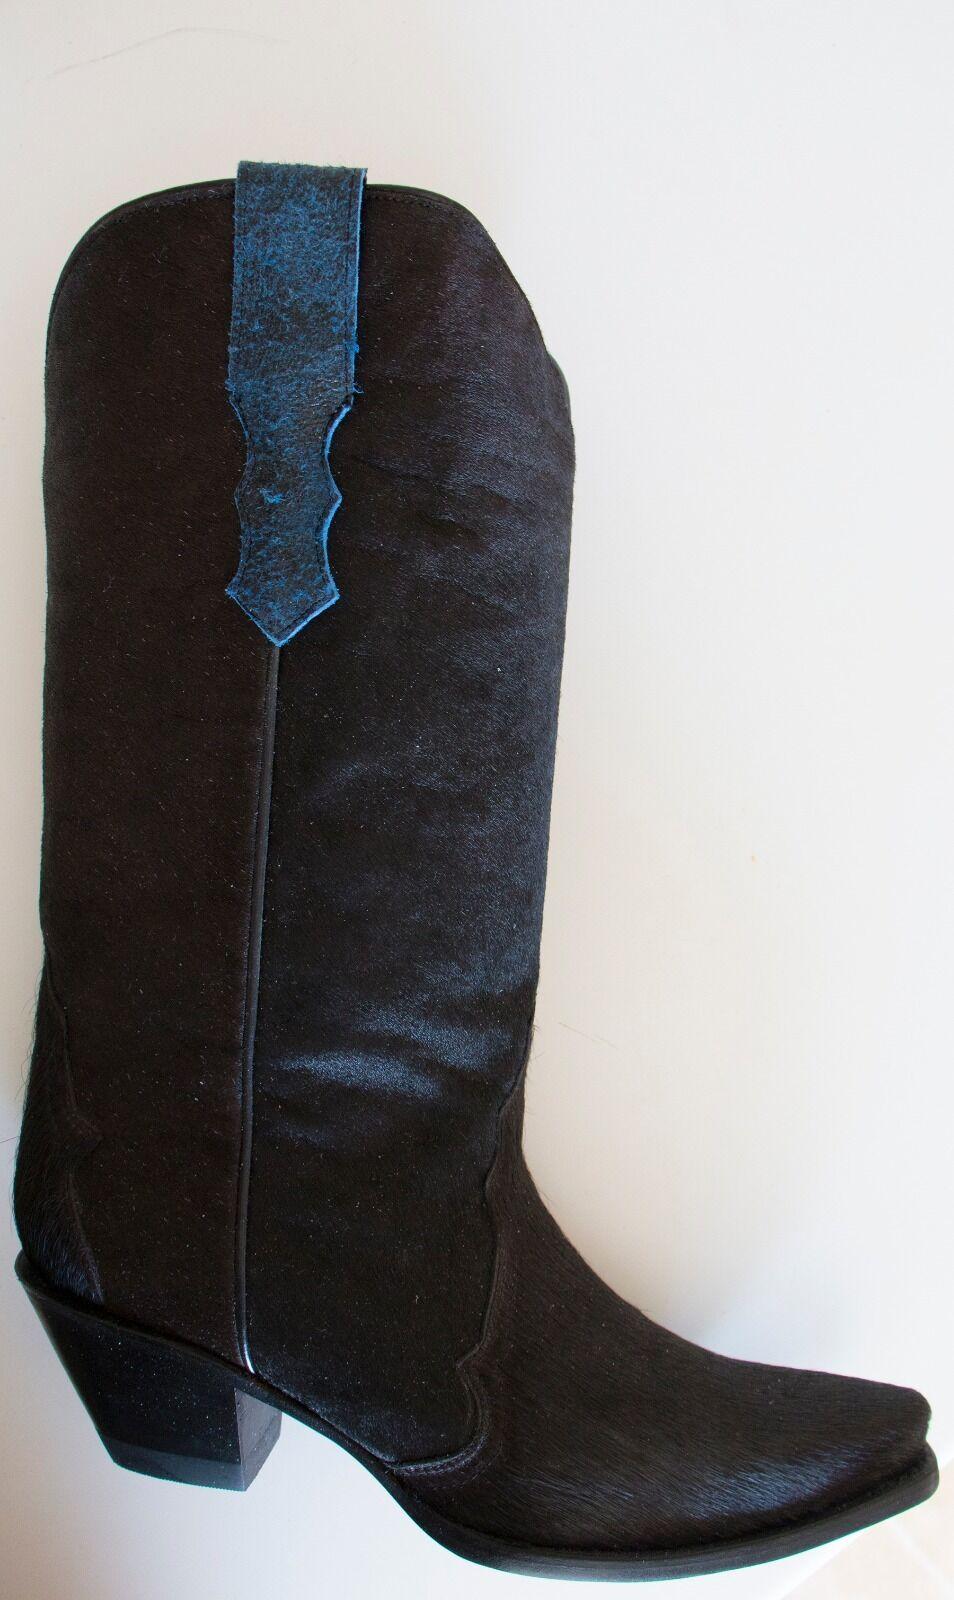 BRAND NEW DONALD PLINER BLACK W/BLUE TRIM CALF HAIR/LEATHER WESTERN BOOTS SZ 10